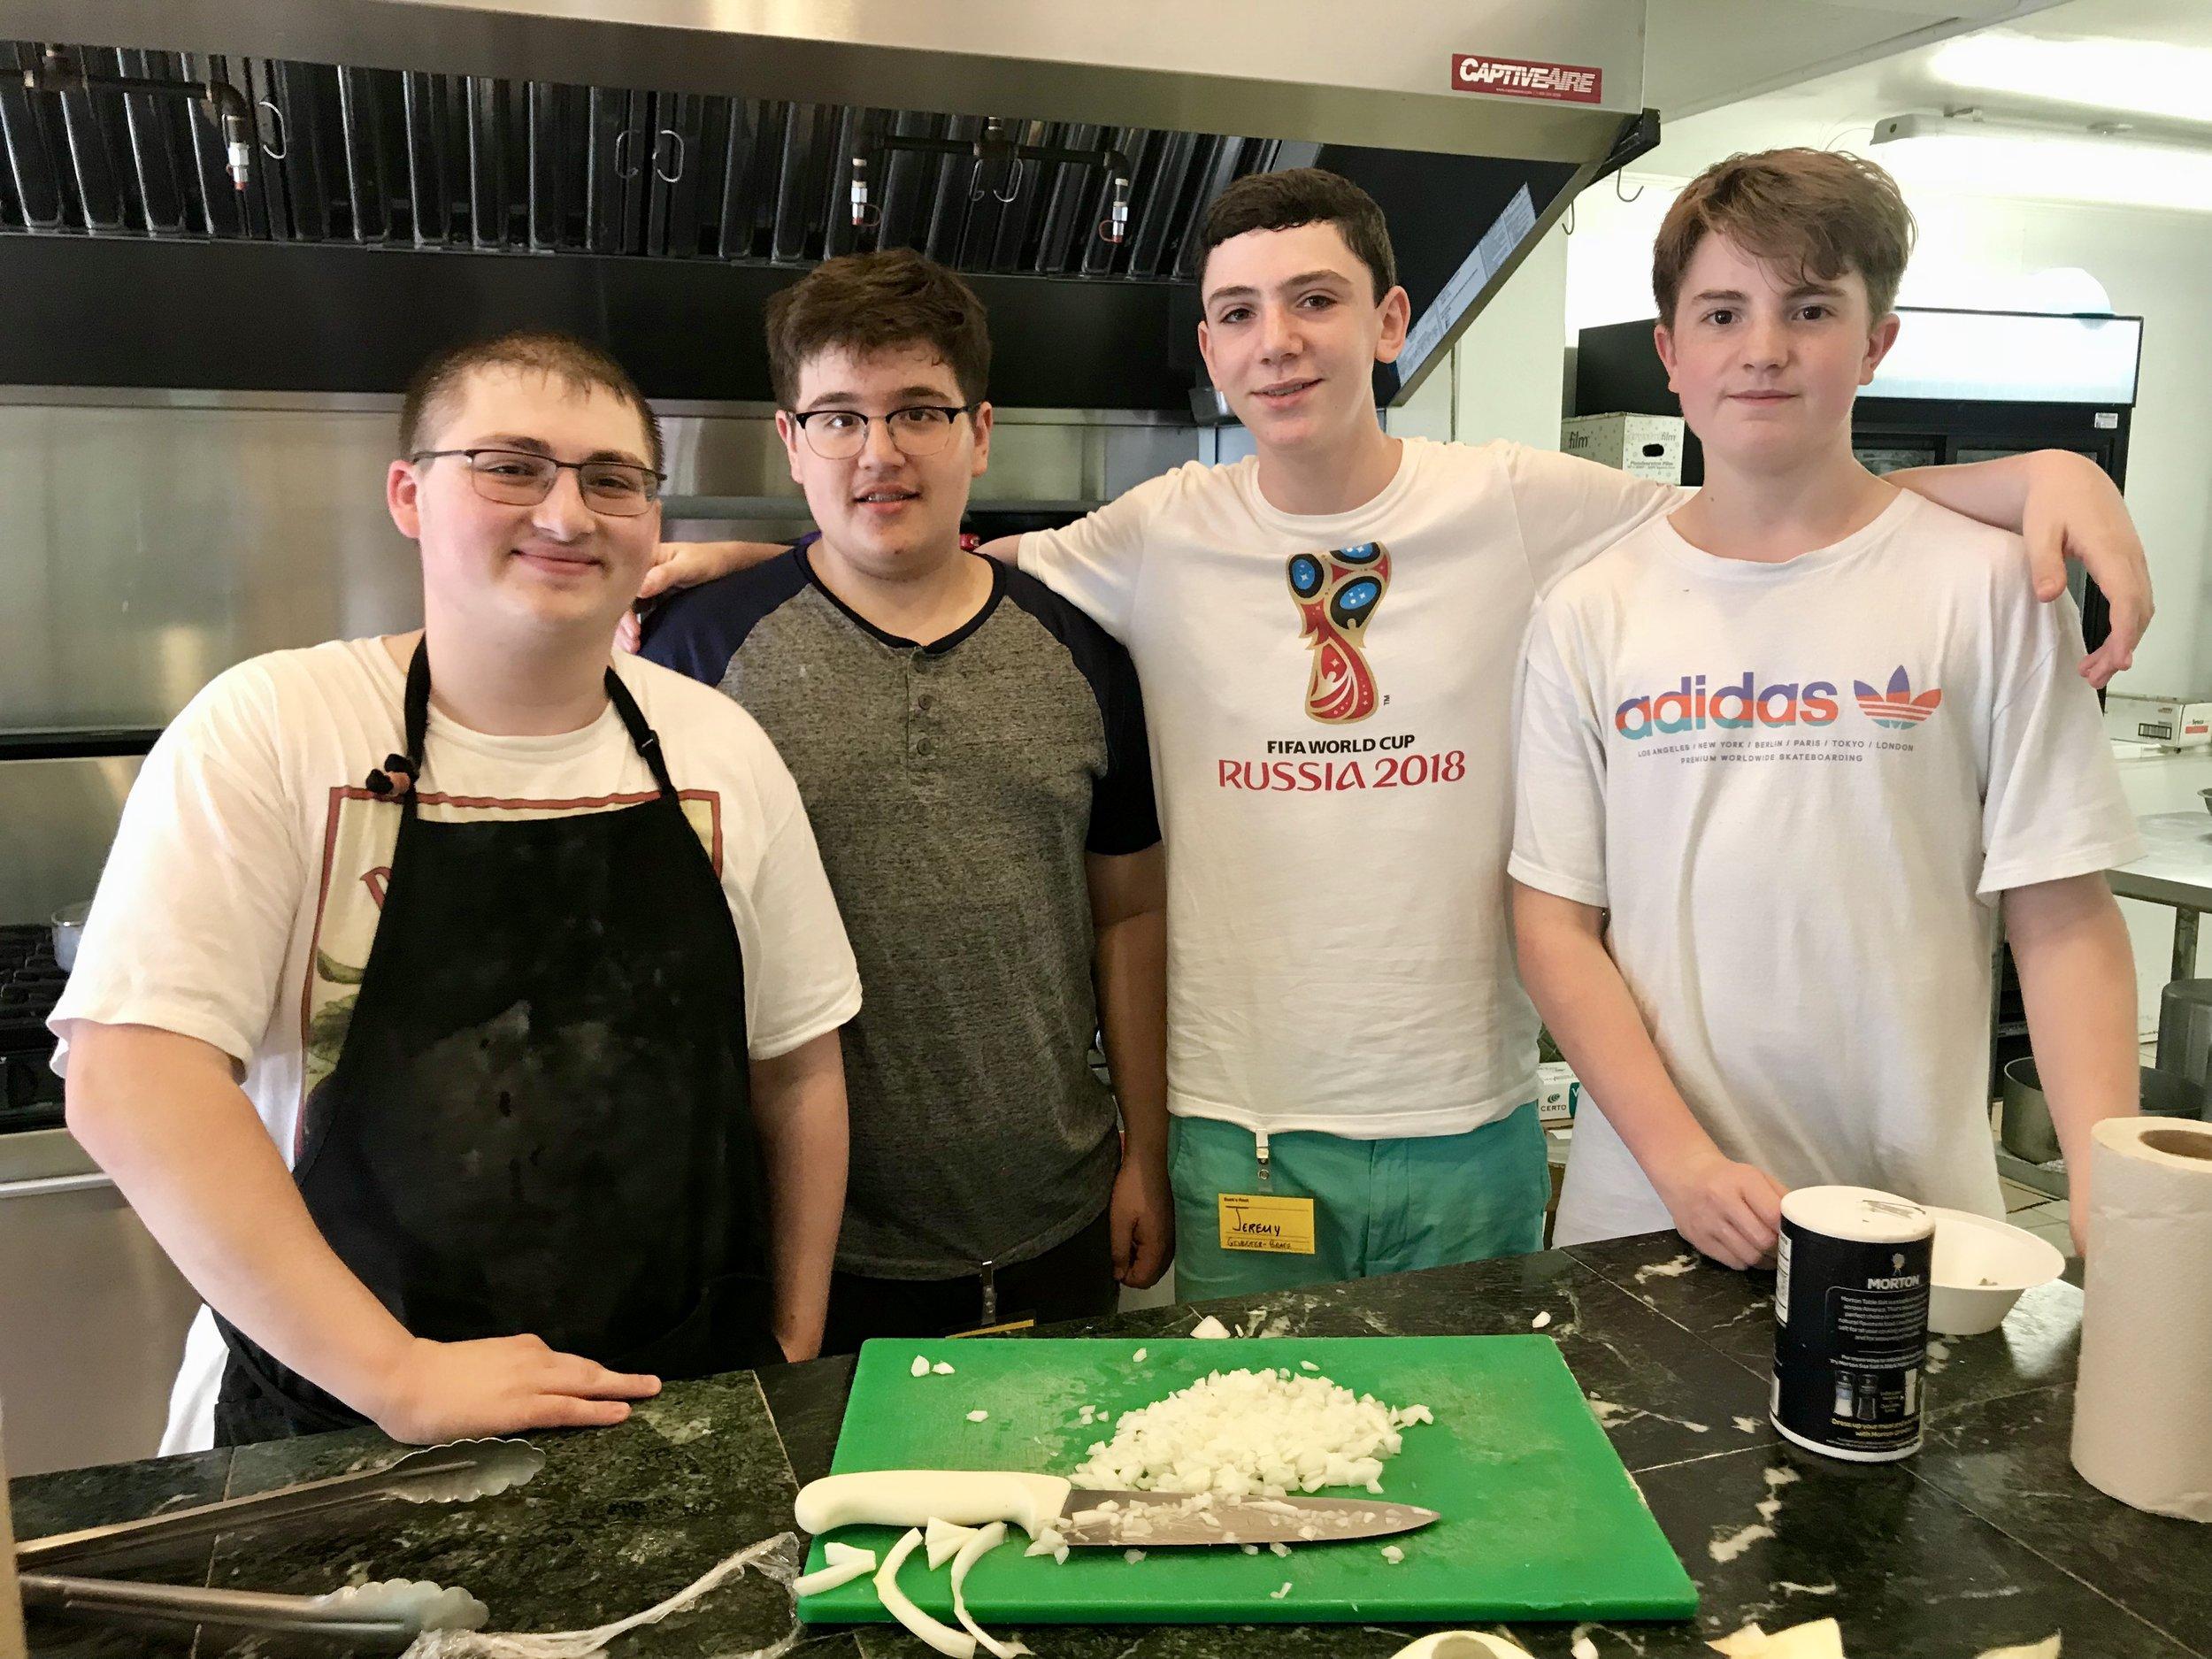 Chopping onions is a team sport!